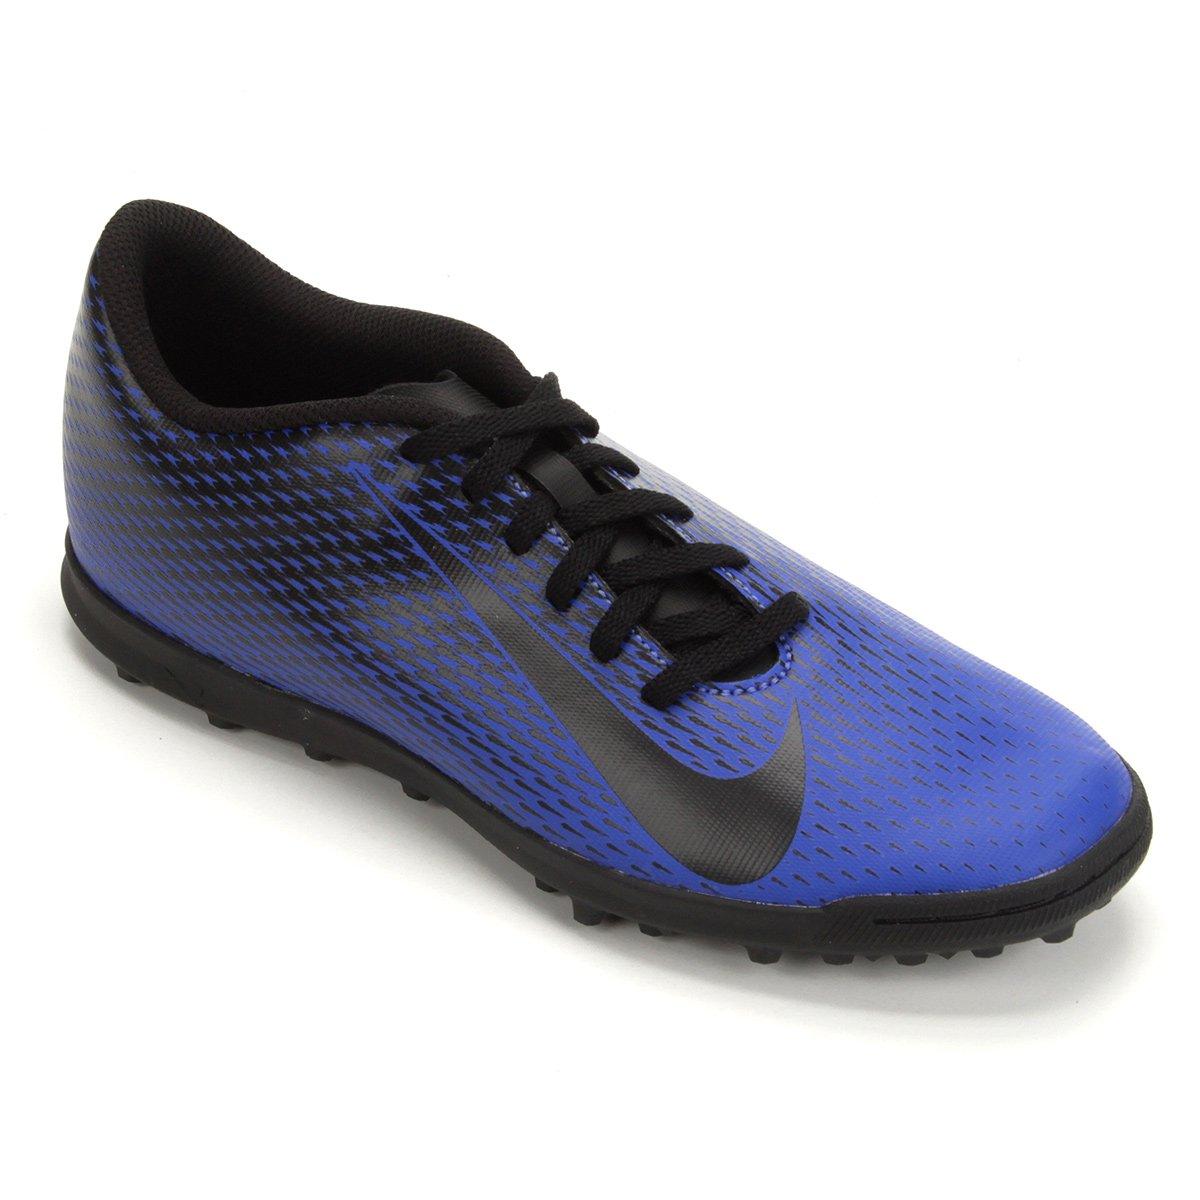 380a07cd418 Chuteira Society Nike Bravata 2 TF - Azul e Preto - Compre Agora ...